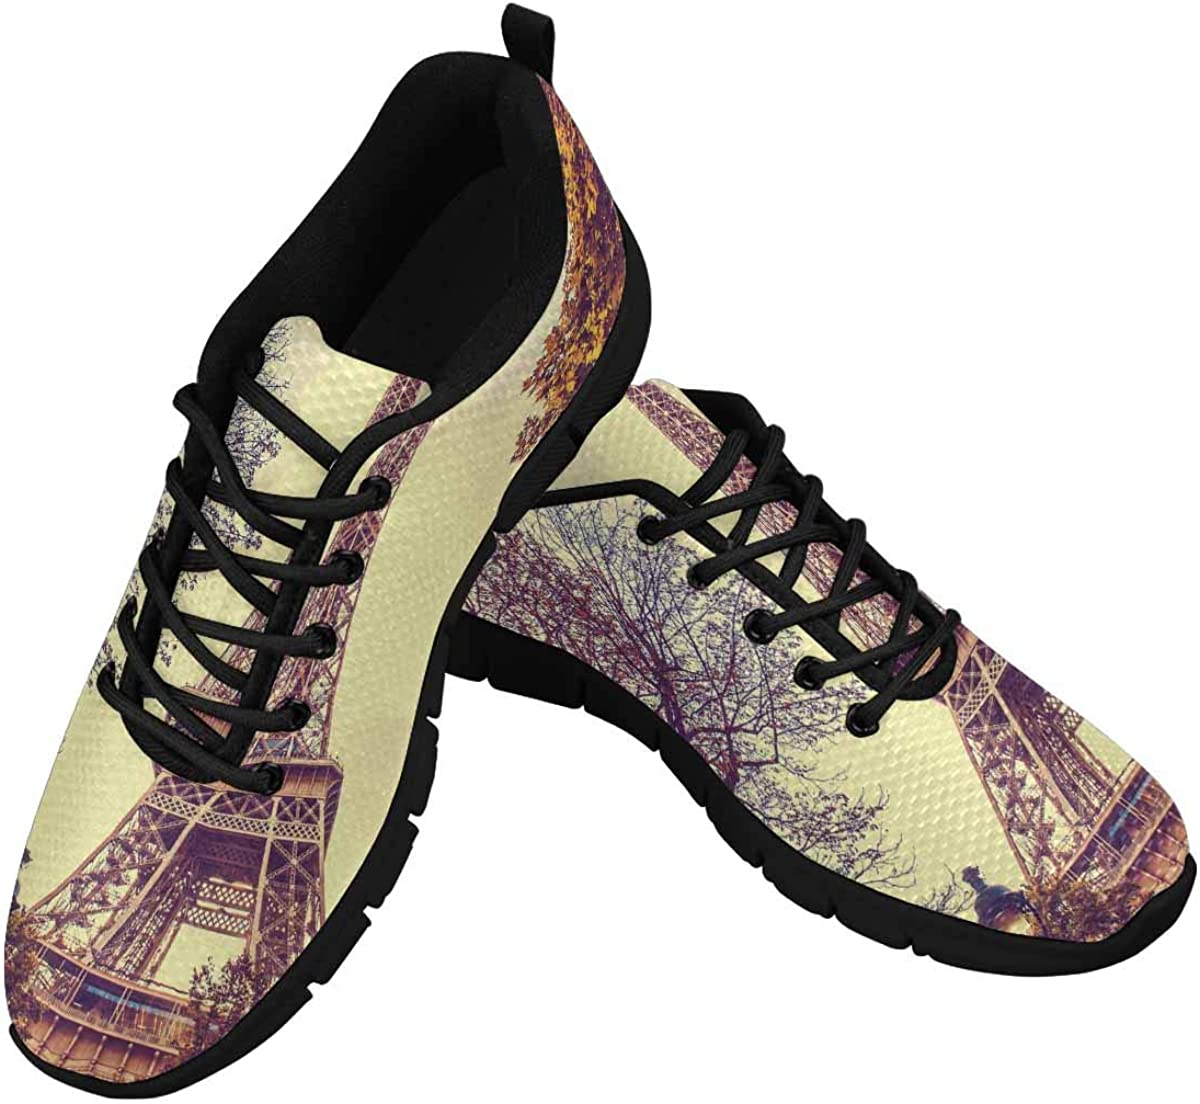 INTERESTPRINT France Eiffel Tower Autumn Women's Athletic Walking Shoes Comfort Mesh Non Slip